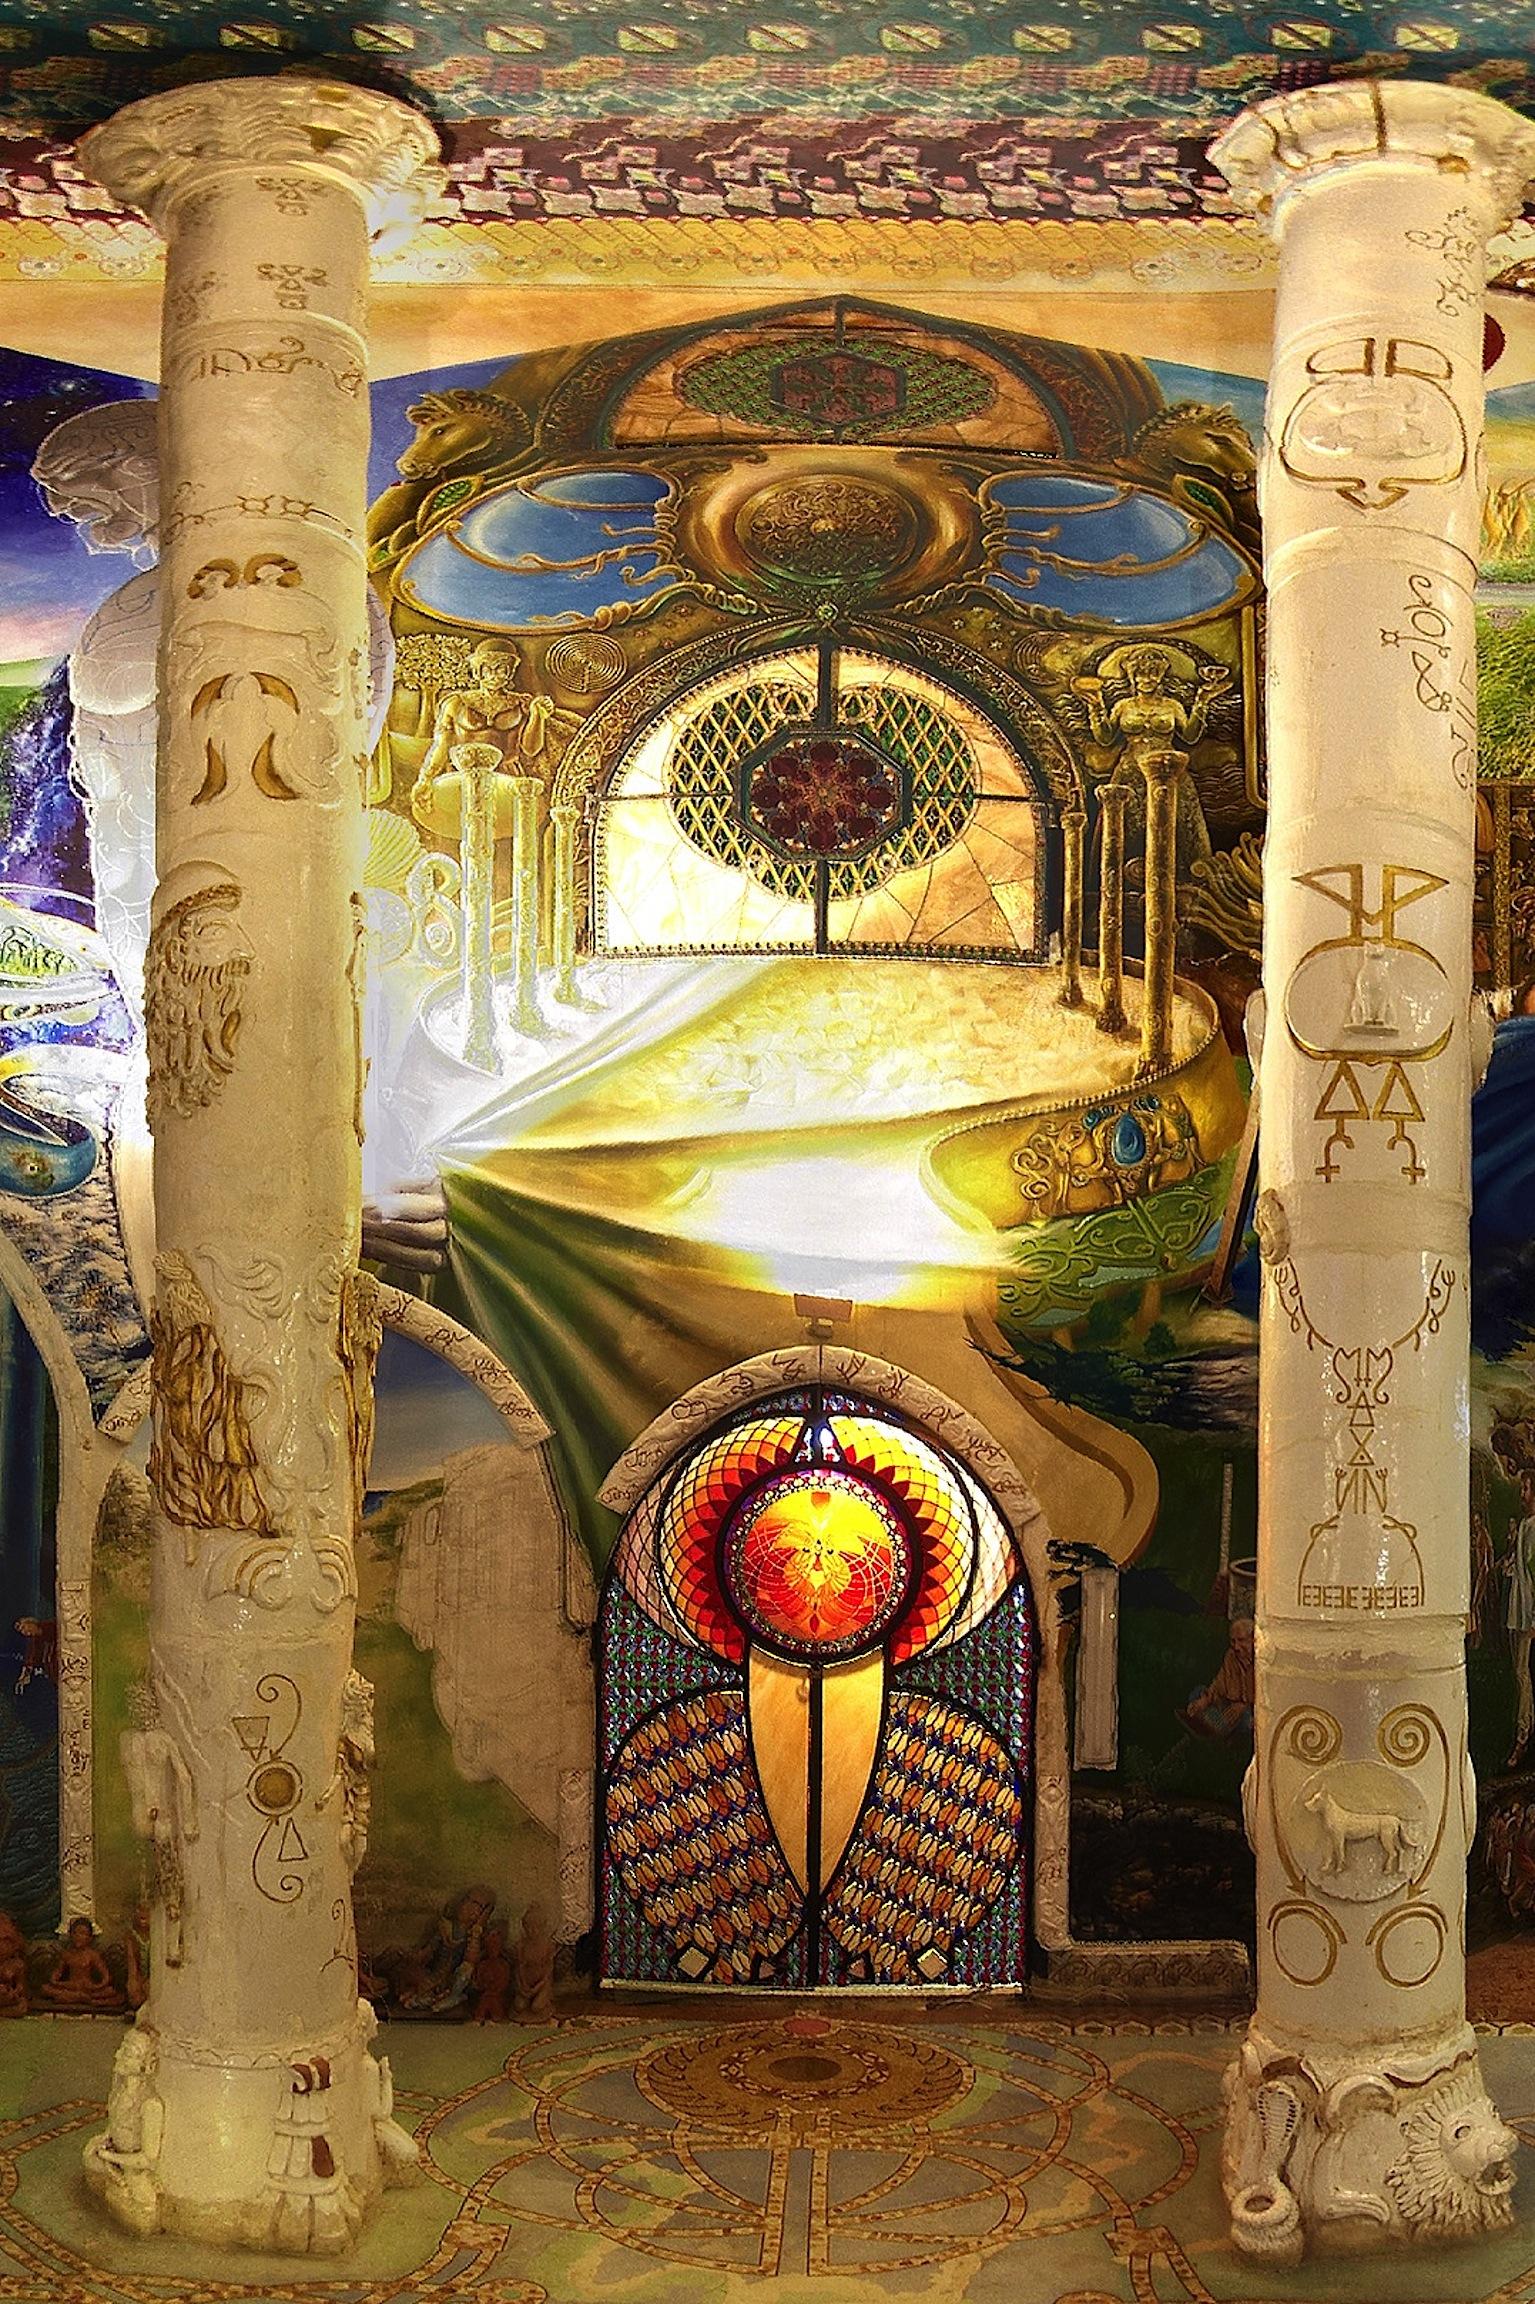 Sala_dalla_terra_templi_umanità_damanhur